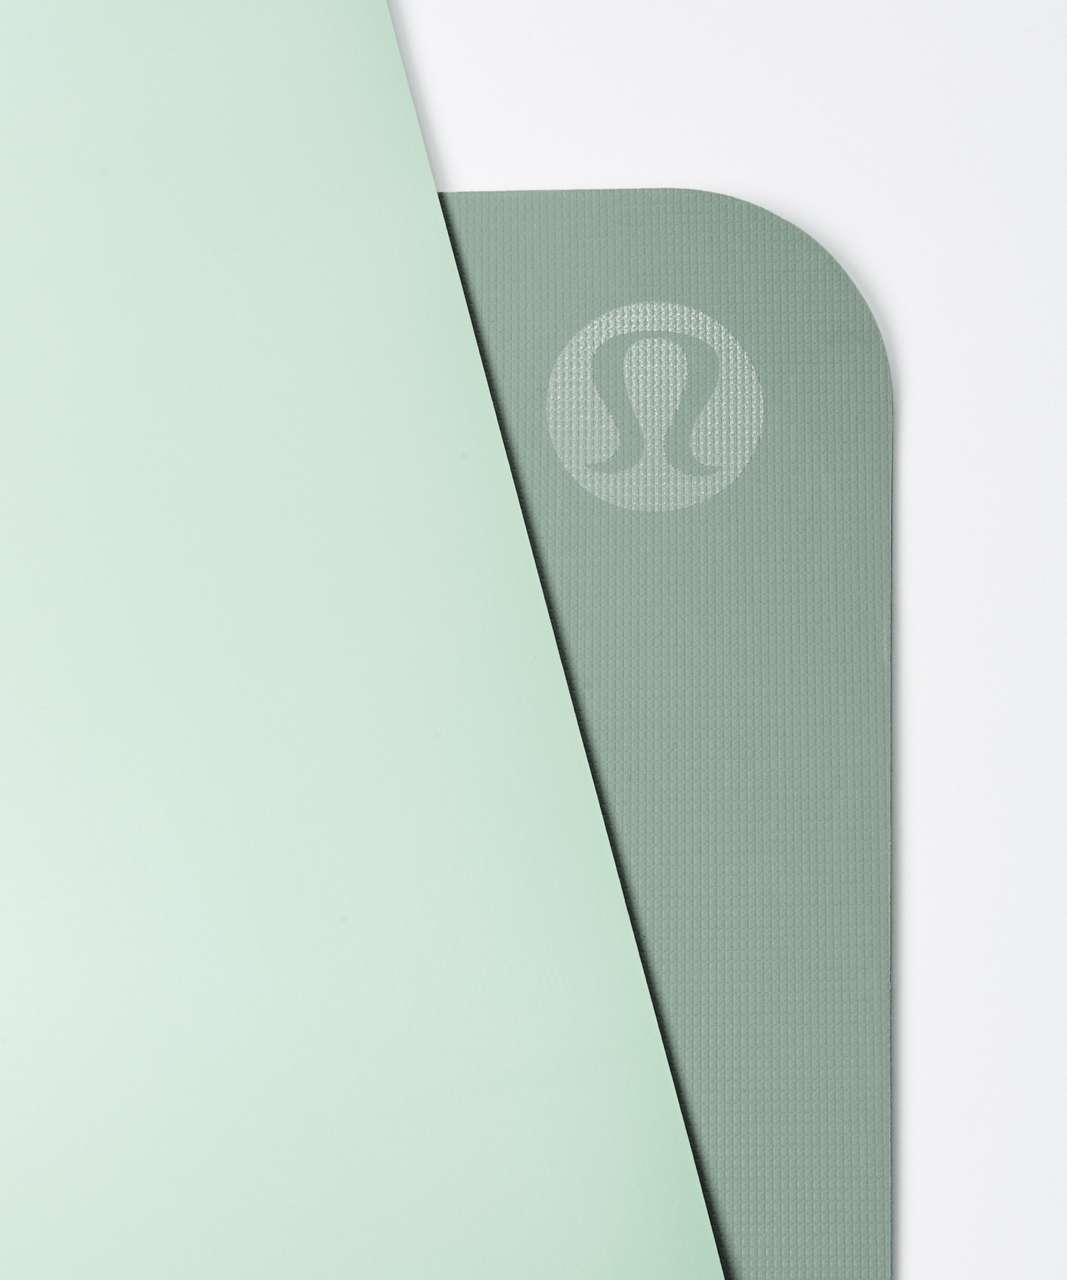 Lululemon The Reversible Mat 5mm - Misty Moss